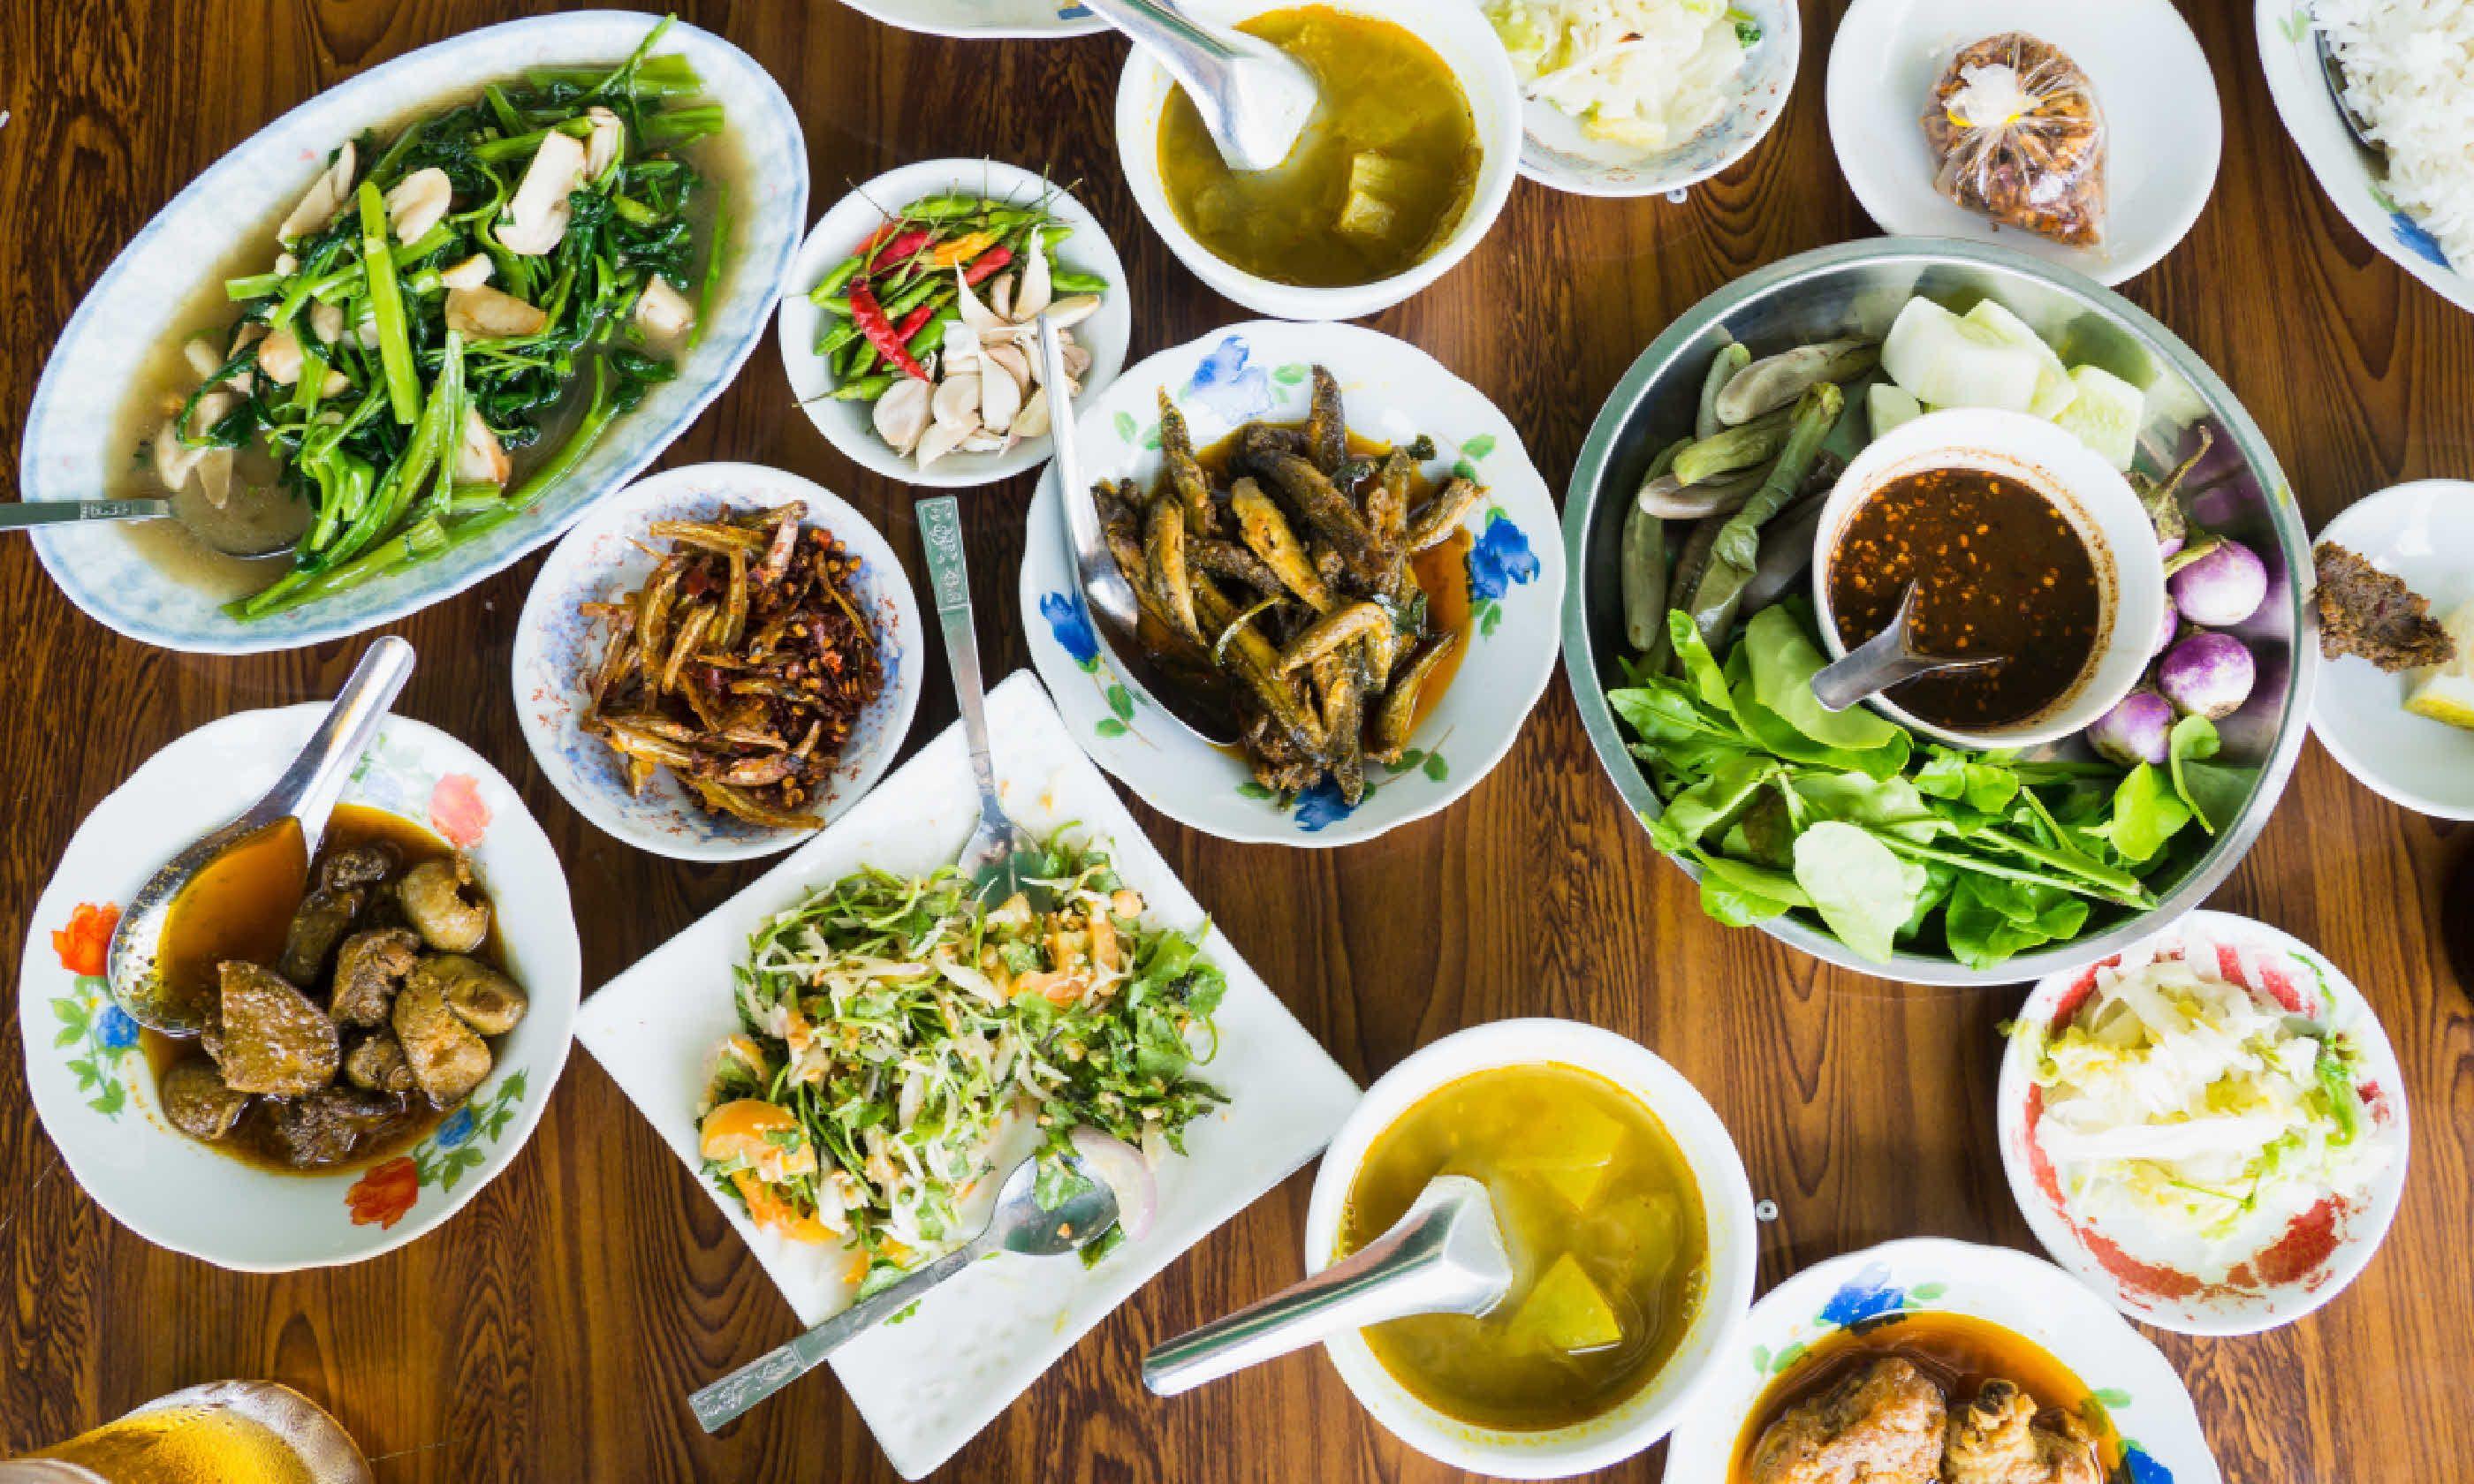 Restaurant table in Burma (Shutterstock)